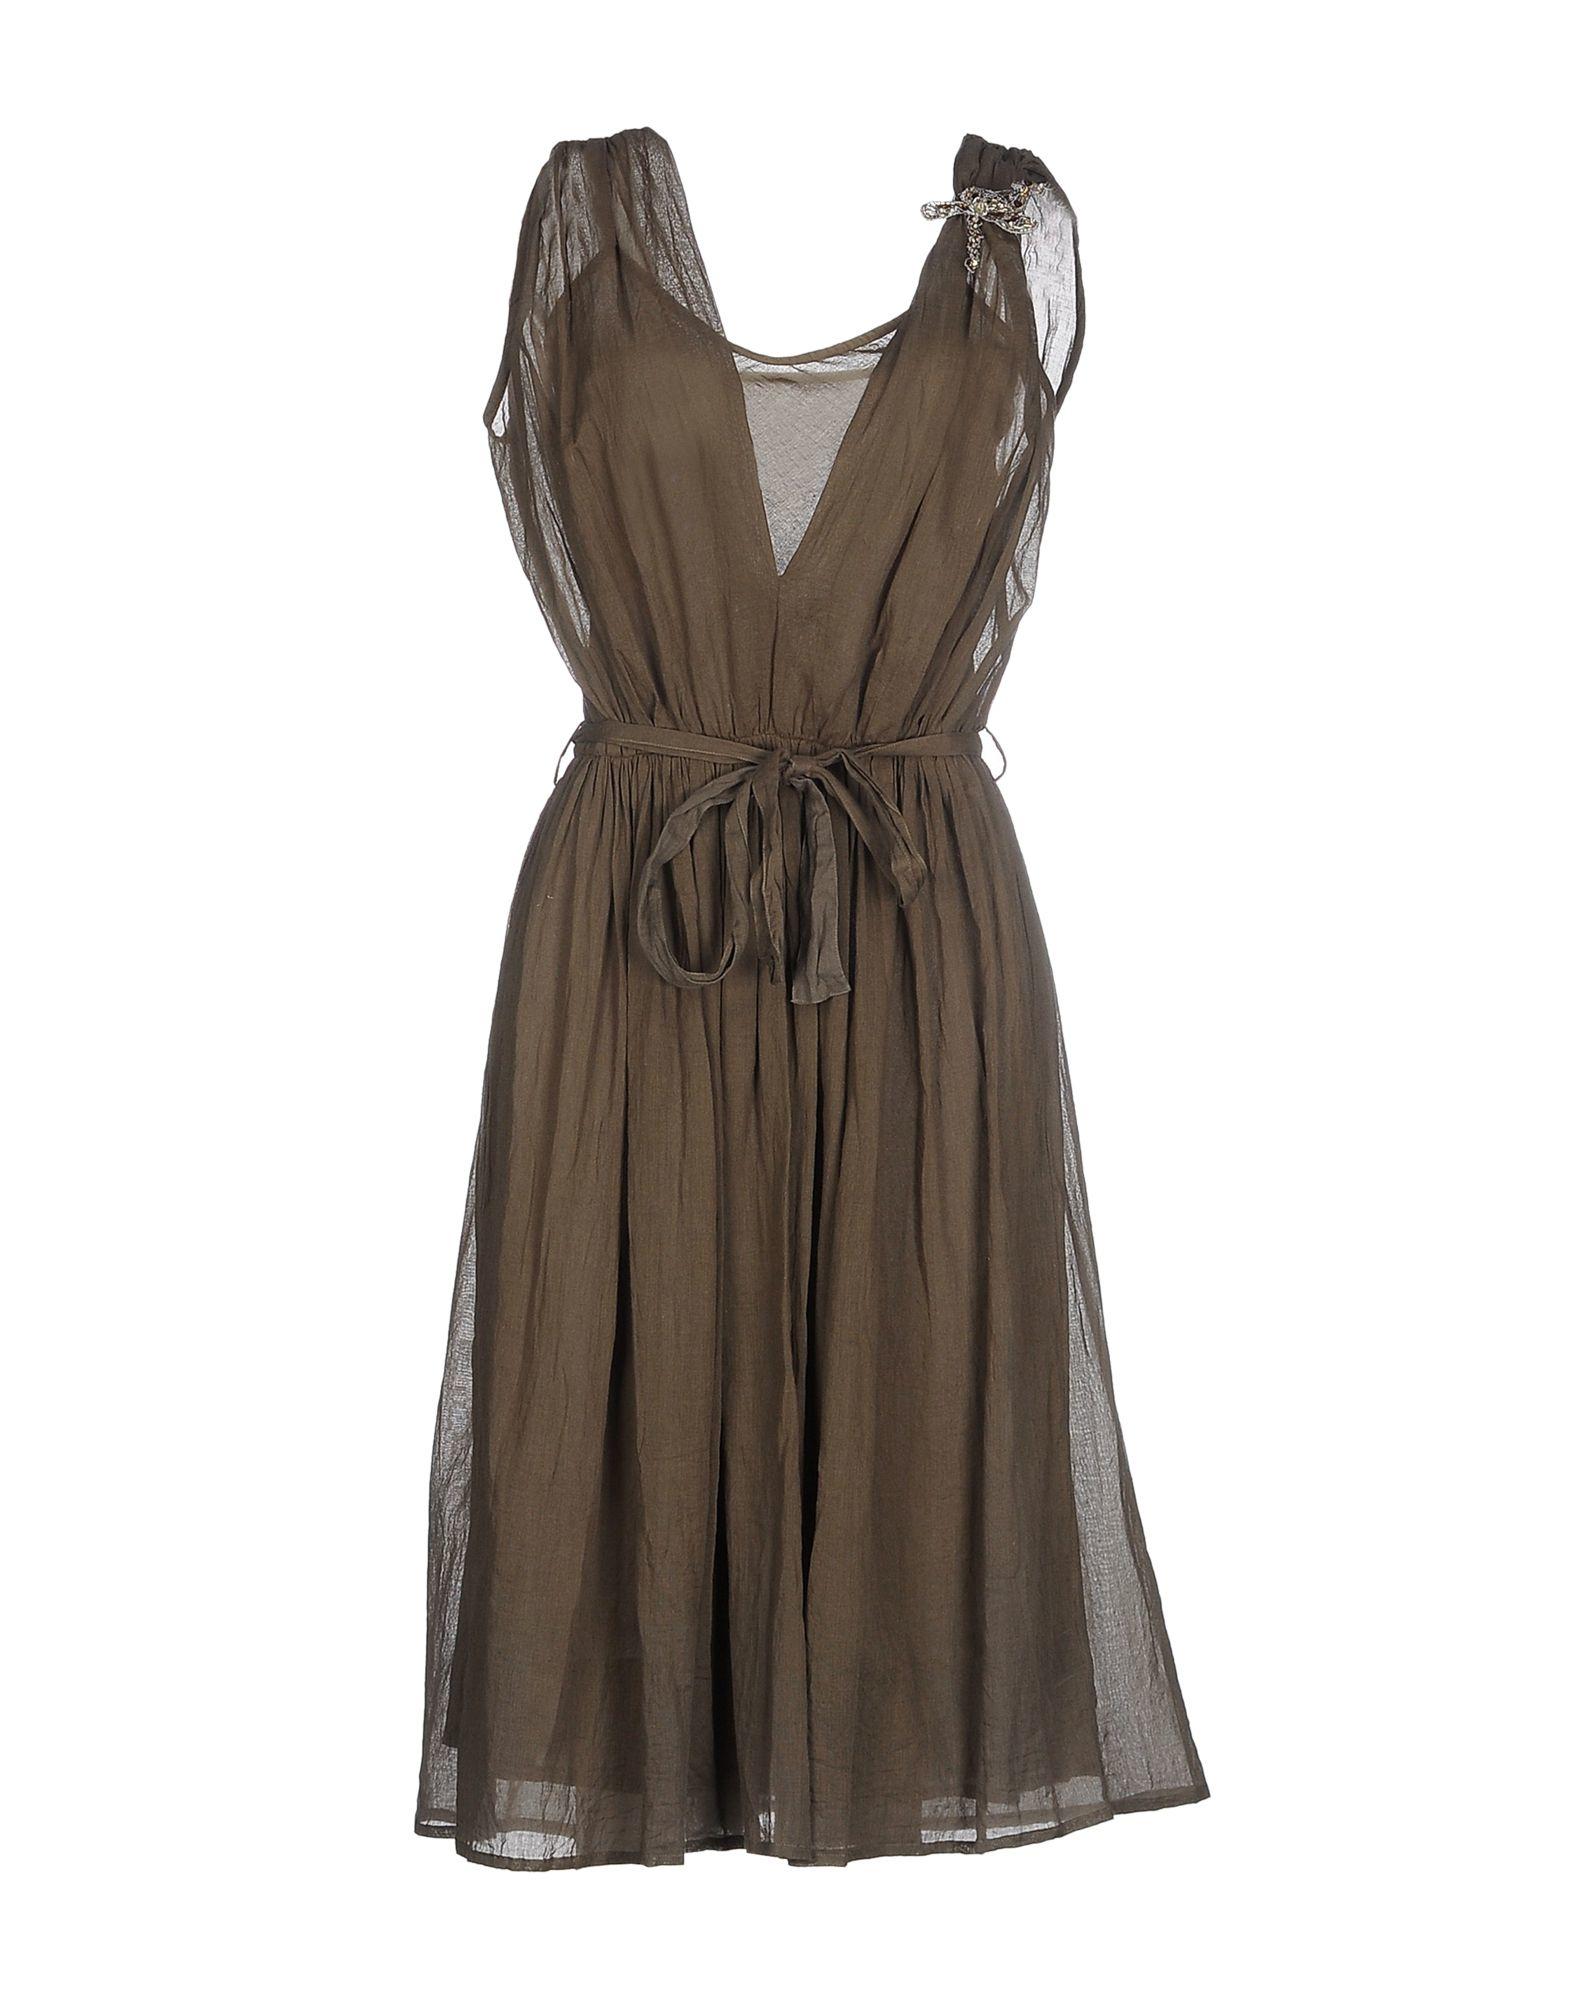 Designer Batik Dress